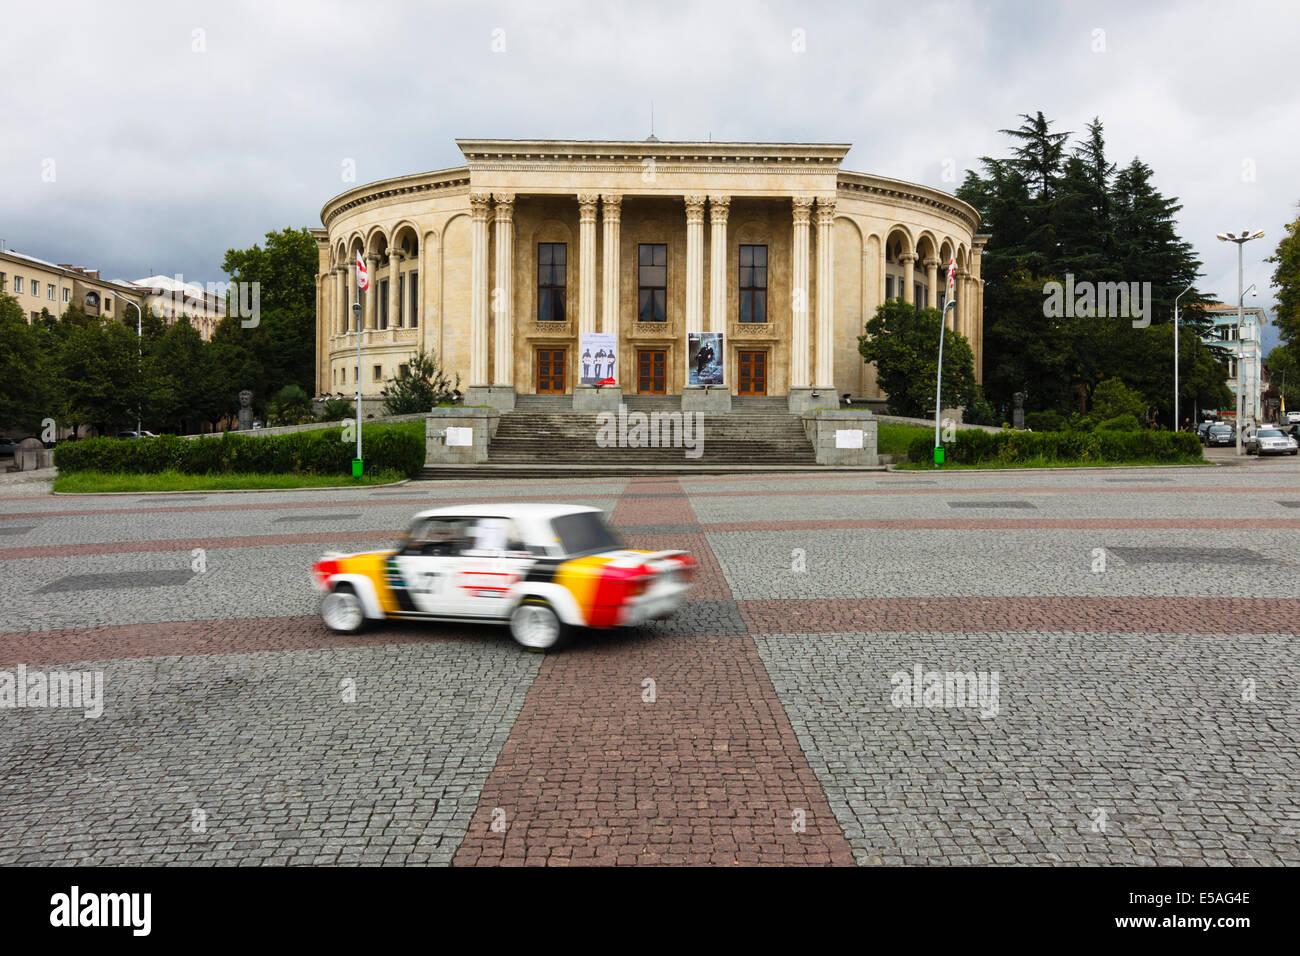 Theatre of Drama at Davit Aghmasheneblis square, Kutaisi, Georgia - Stock Image